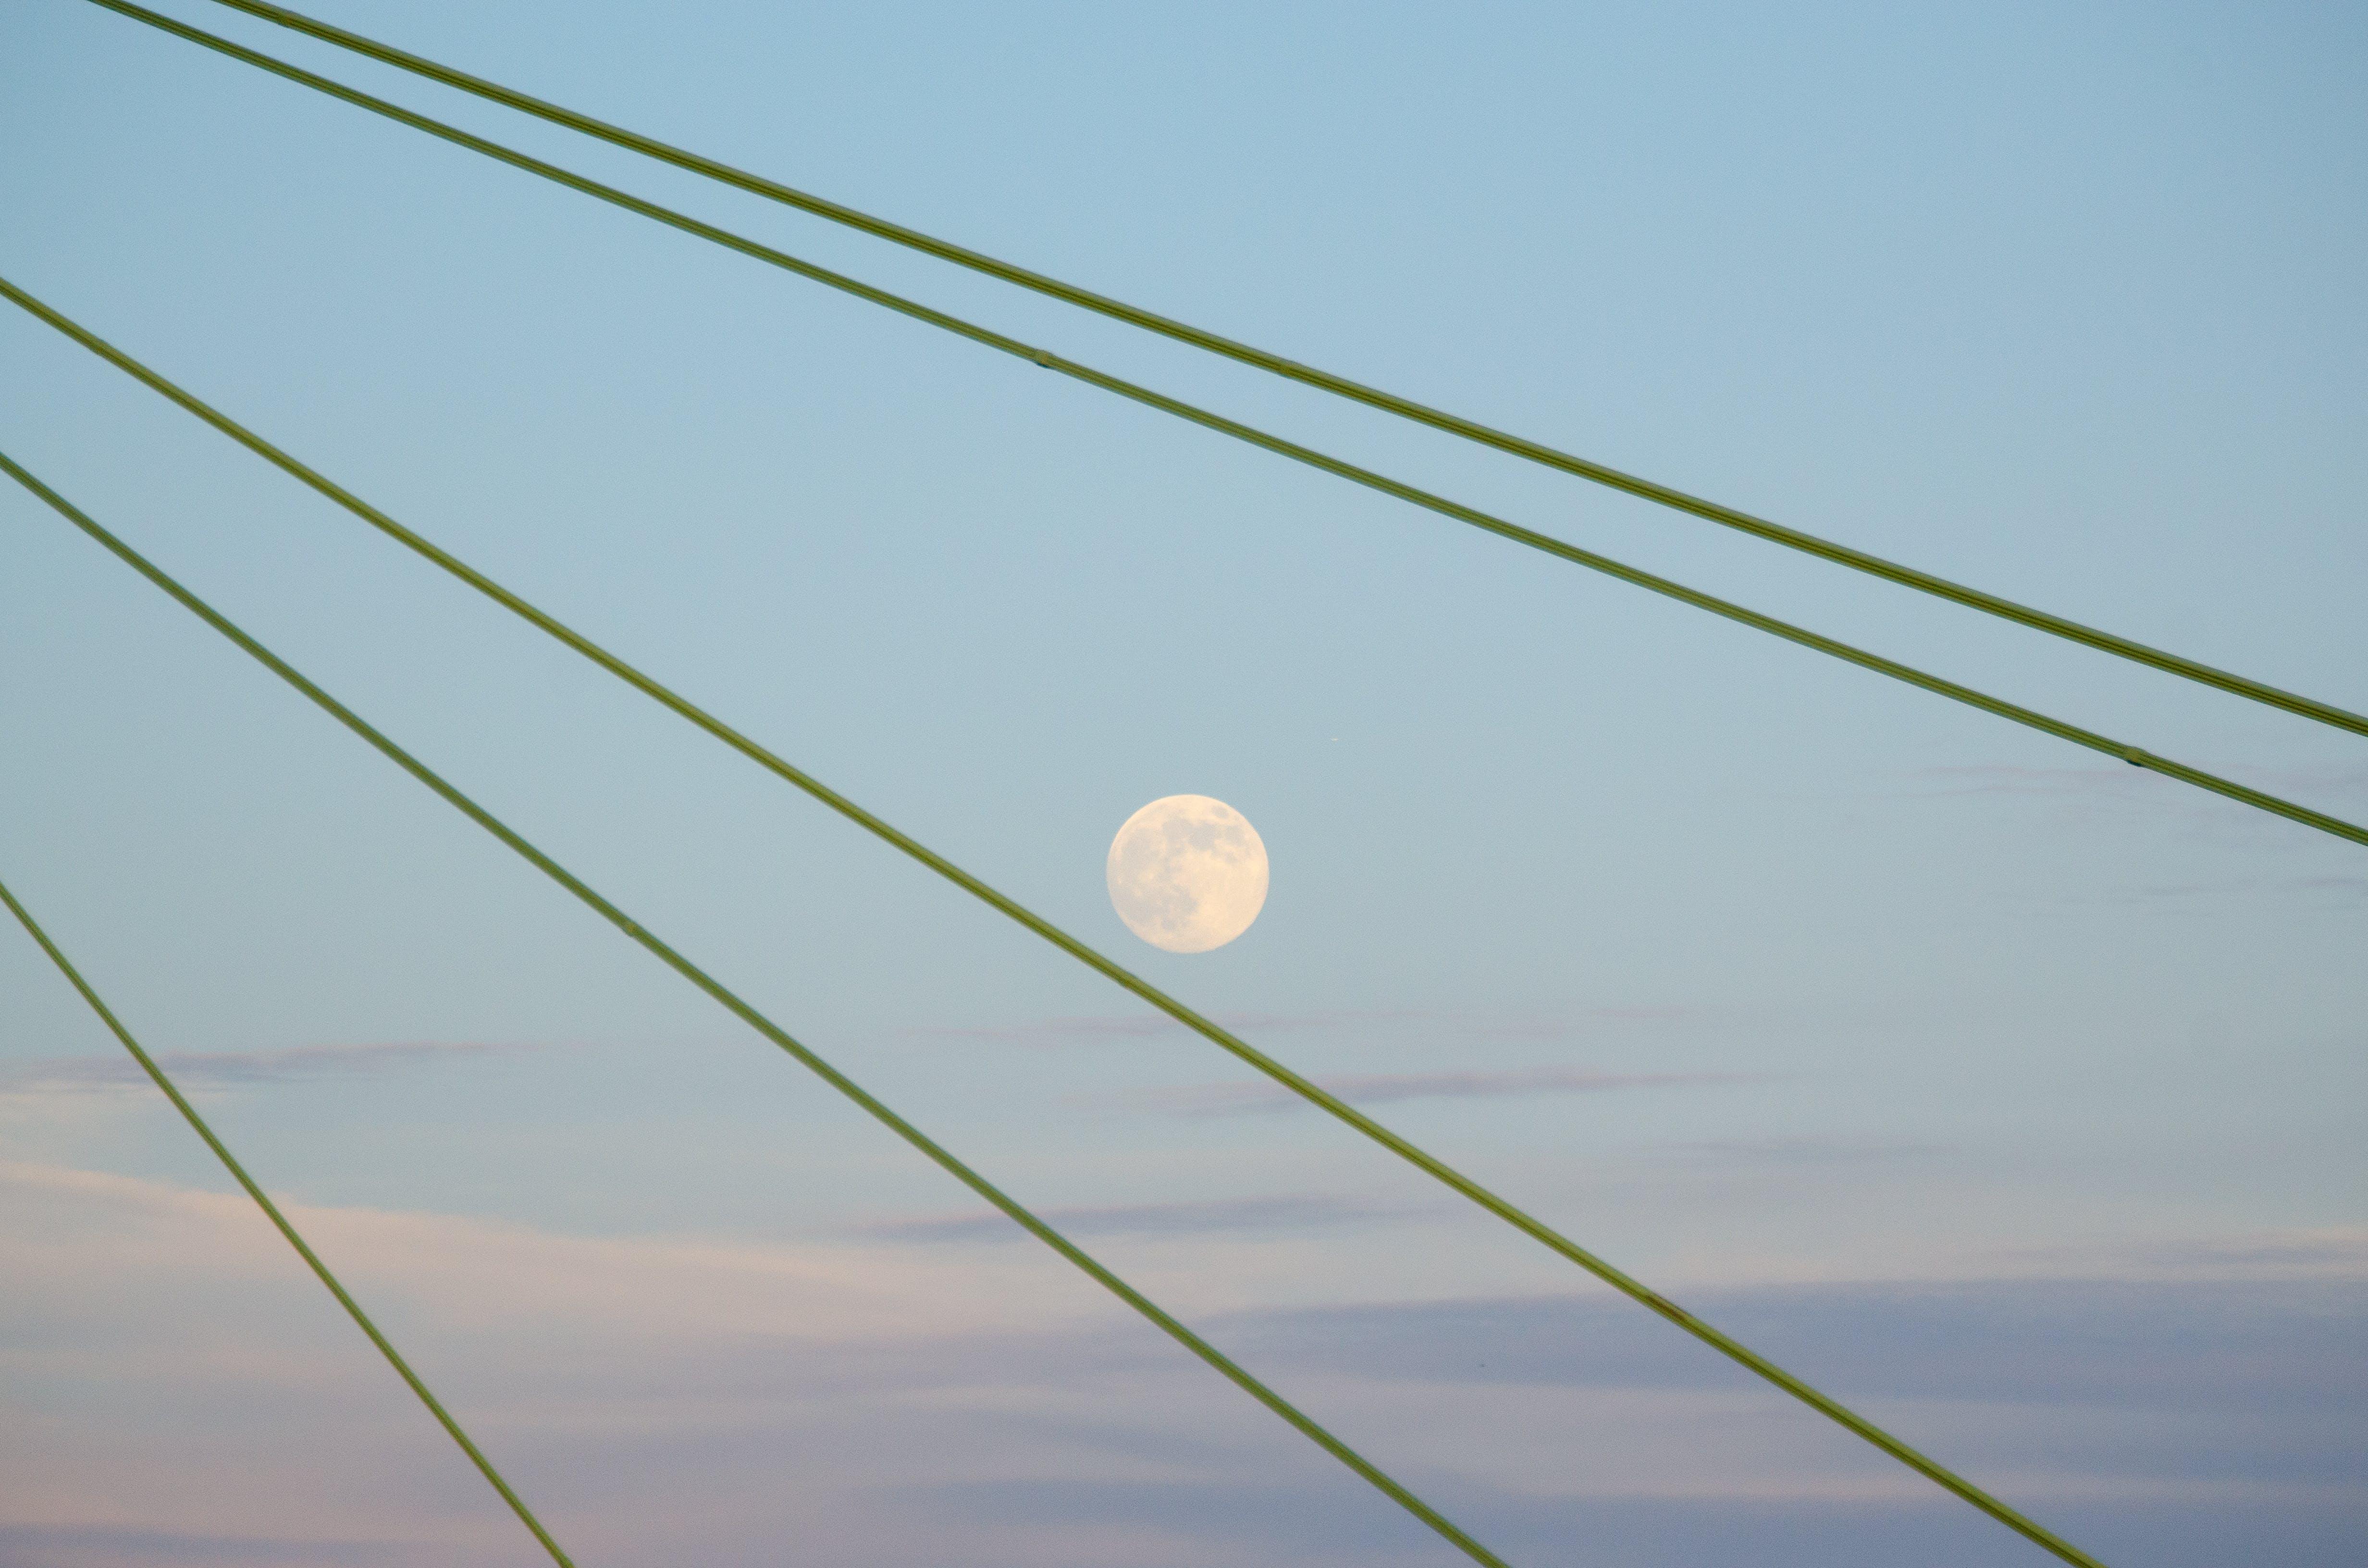 Free stock photo of blue sky, bridge, clear sky, daylight